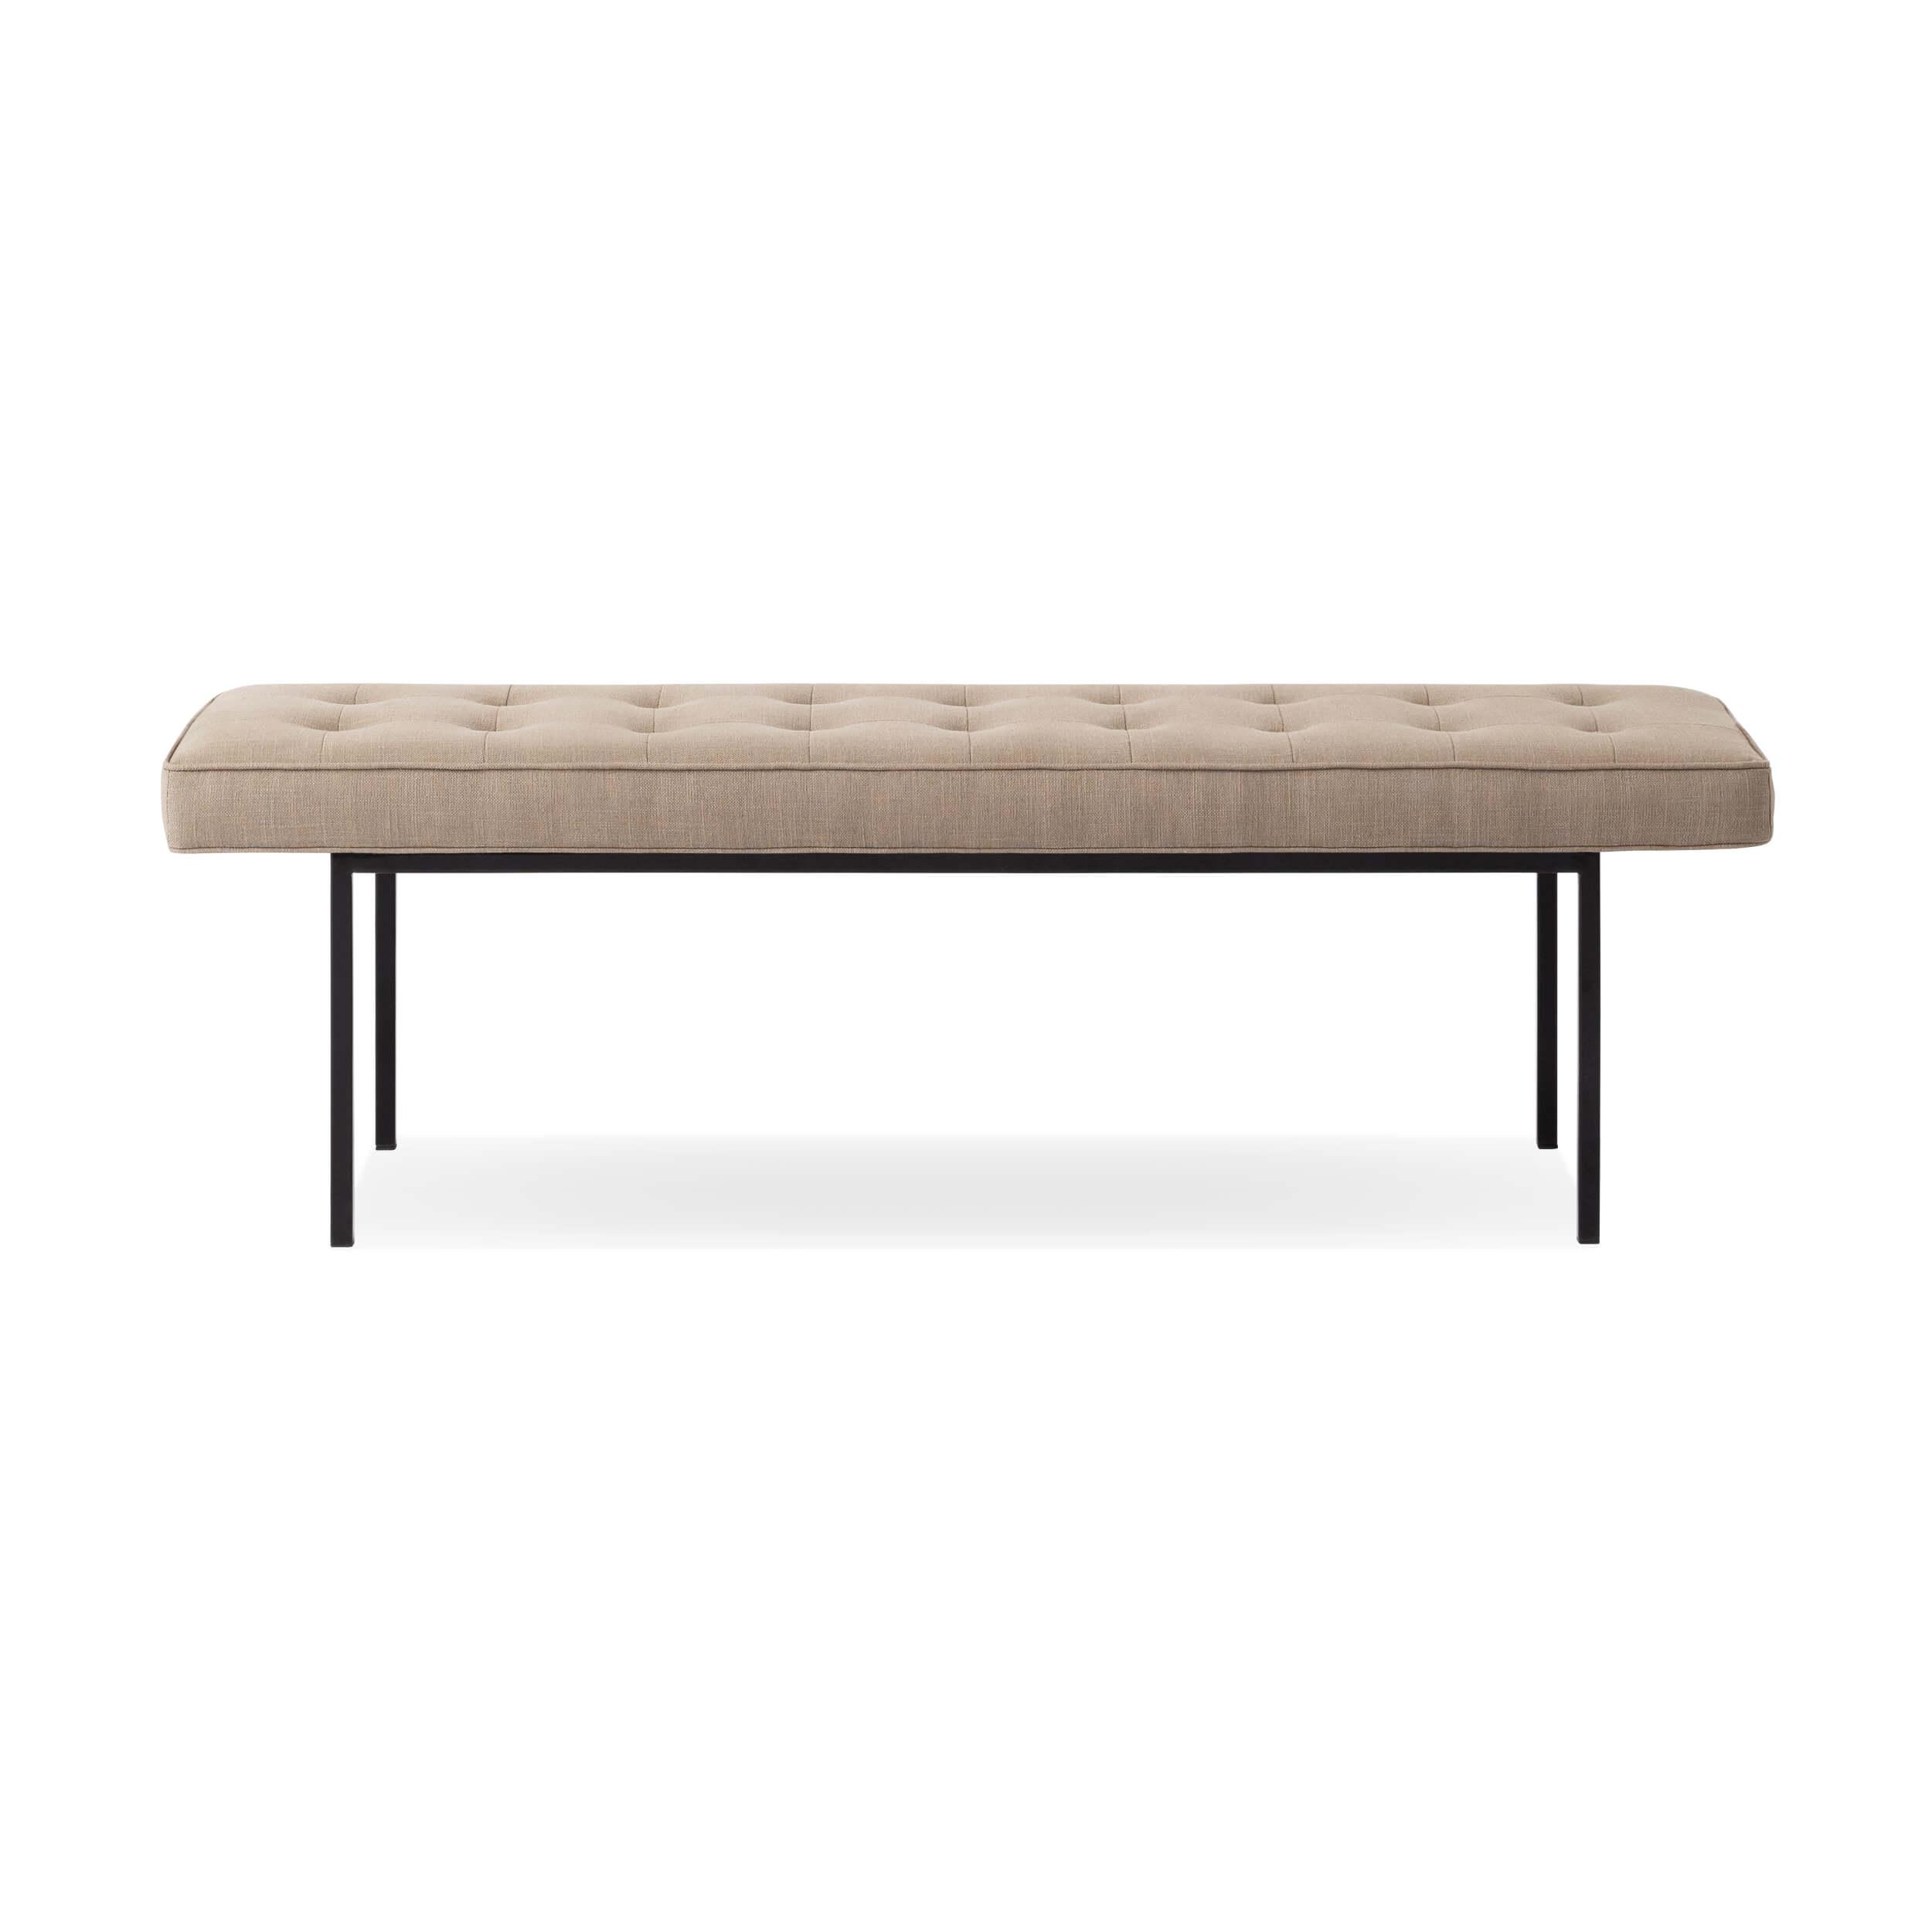 Fabulous Bank Bench Fabric Inzonedesignstudio Interior Chair Design Inzonedesignstudiocom